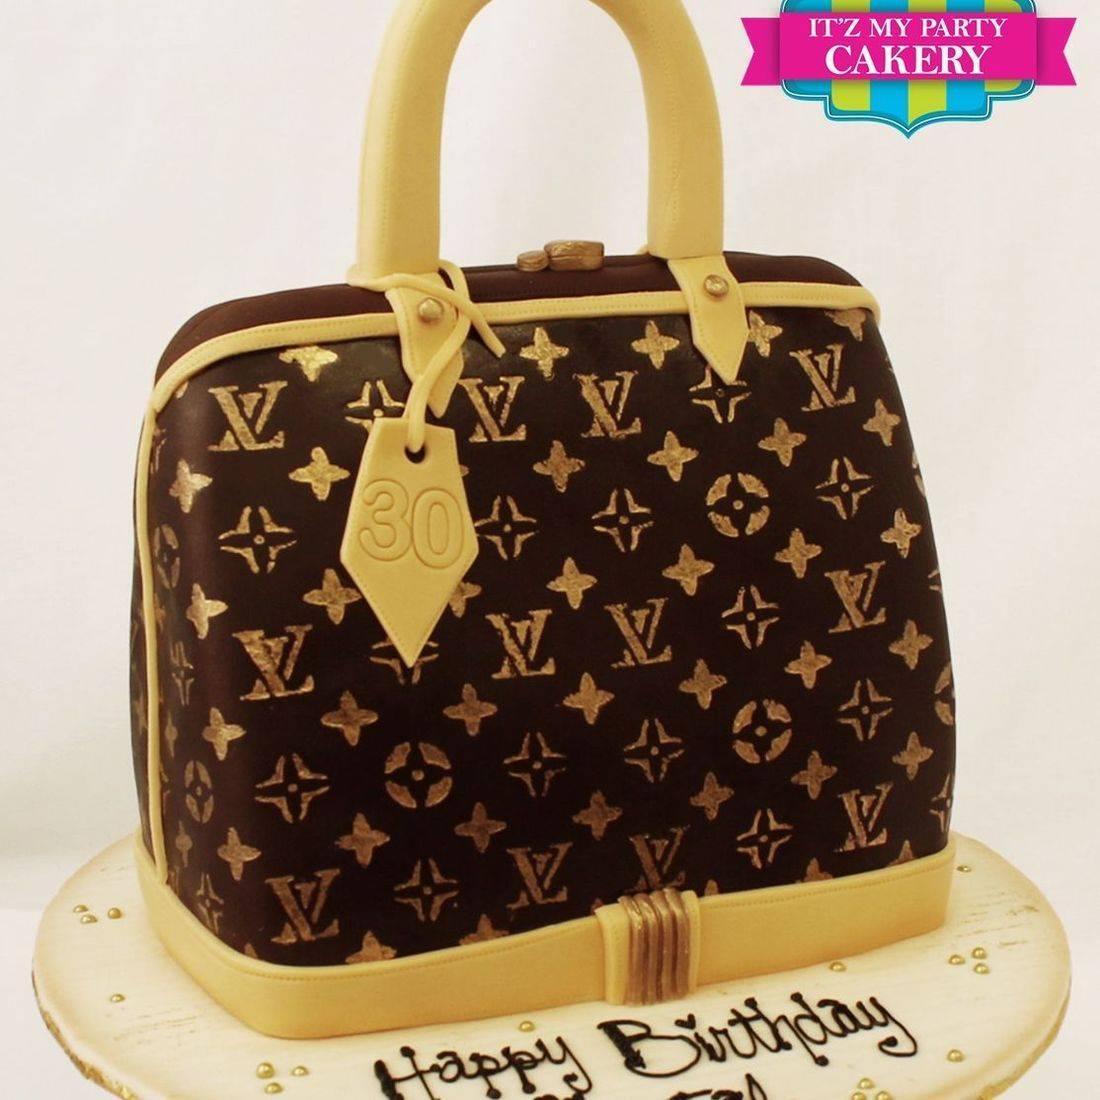 Brown Gold LV Purse Cake Dimensional Cake Milwaukee